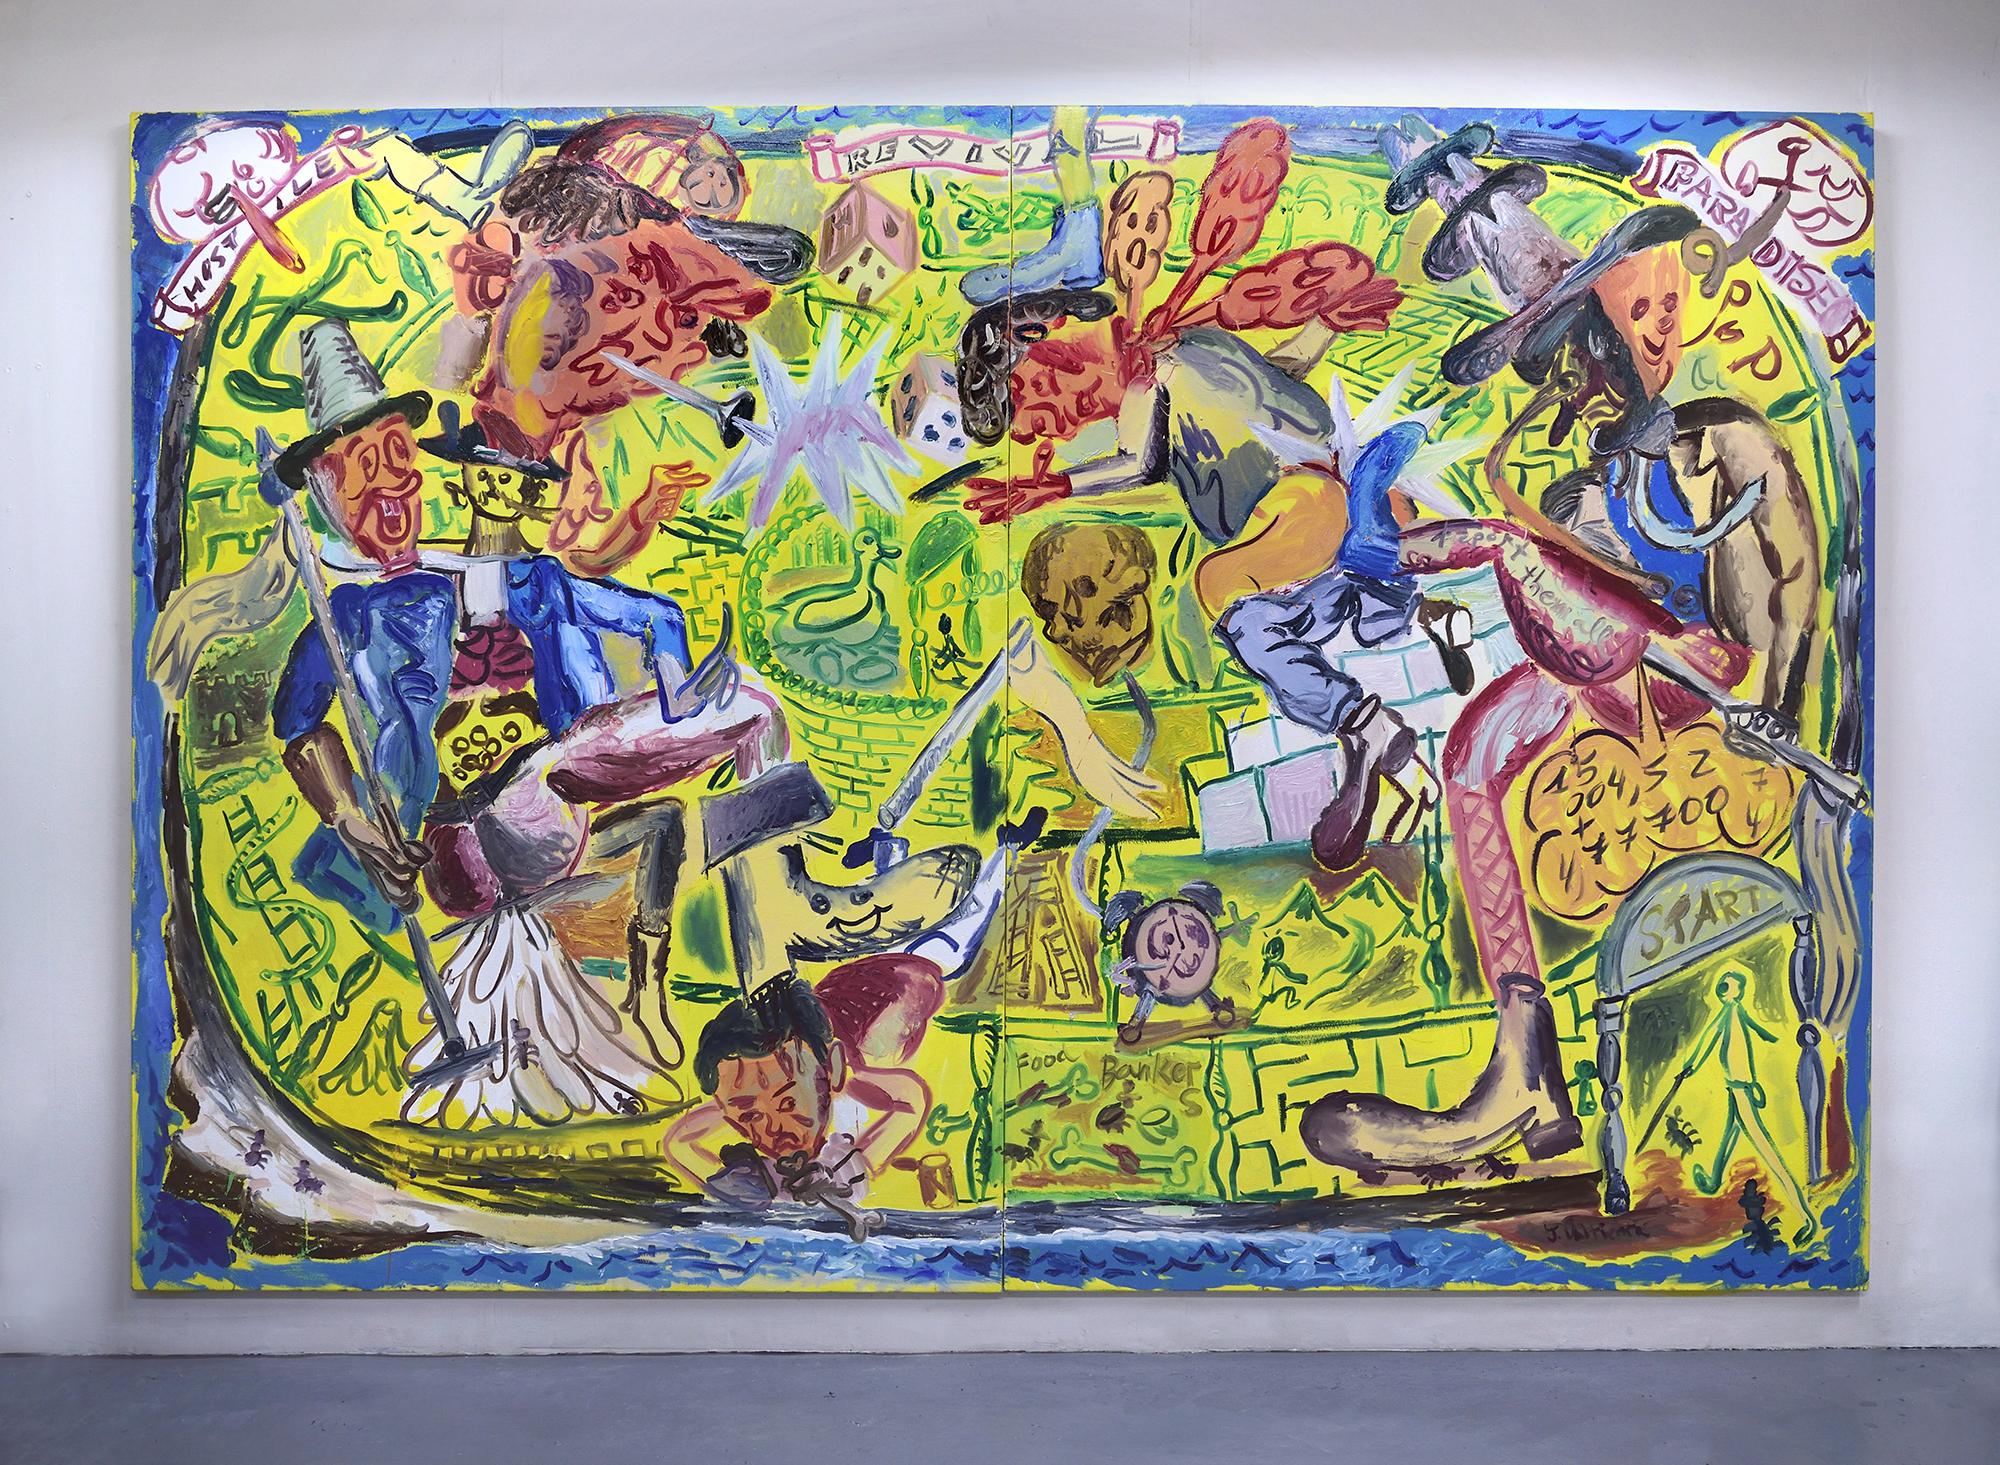 'Hostile Revival Paradise' 2019   Oil on canvas. 200 x 300 cm